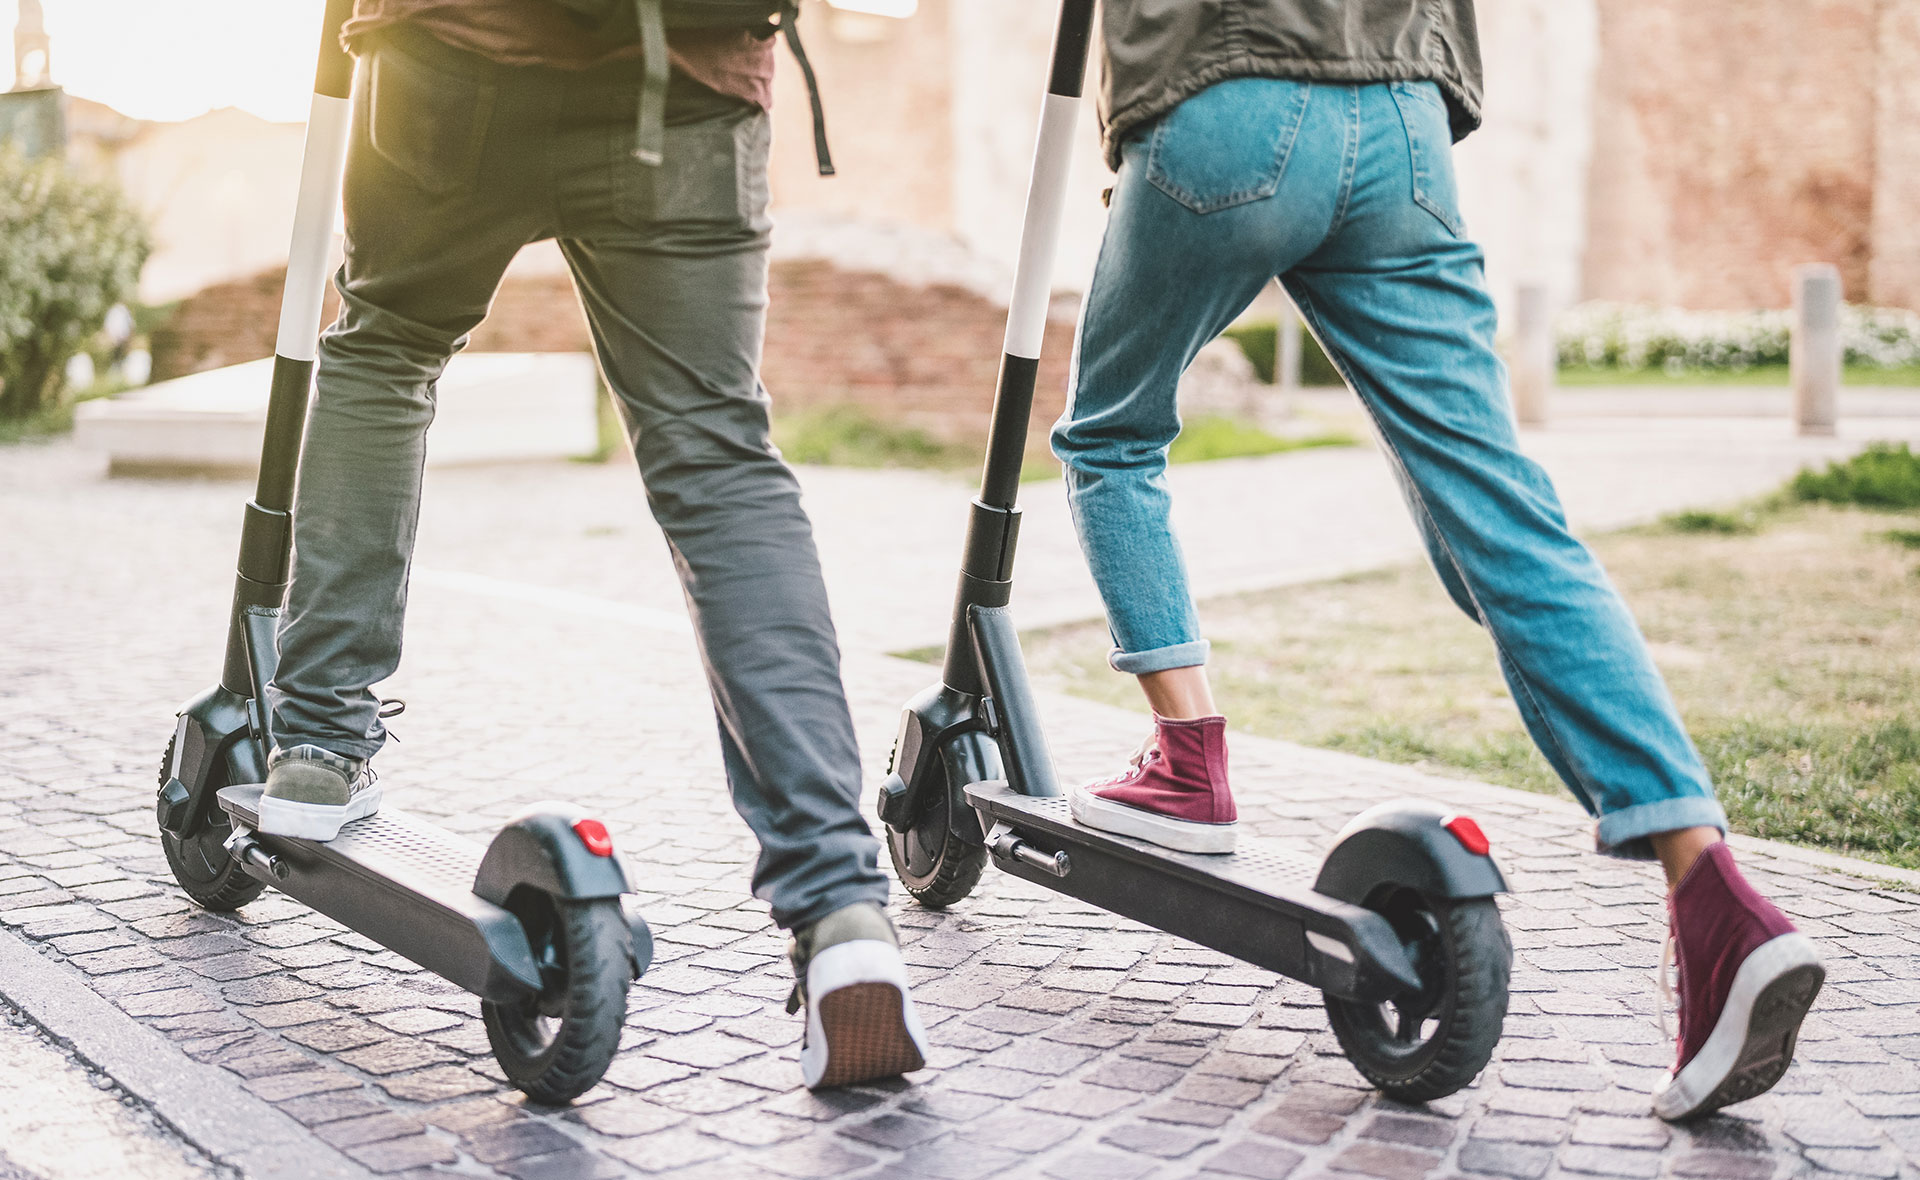 movibilidad-sostenible-patinete-electrico-bbva